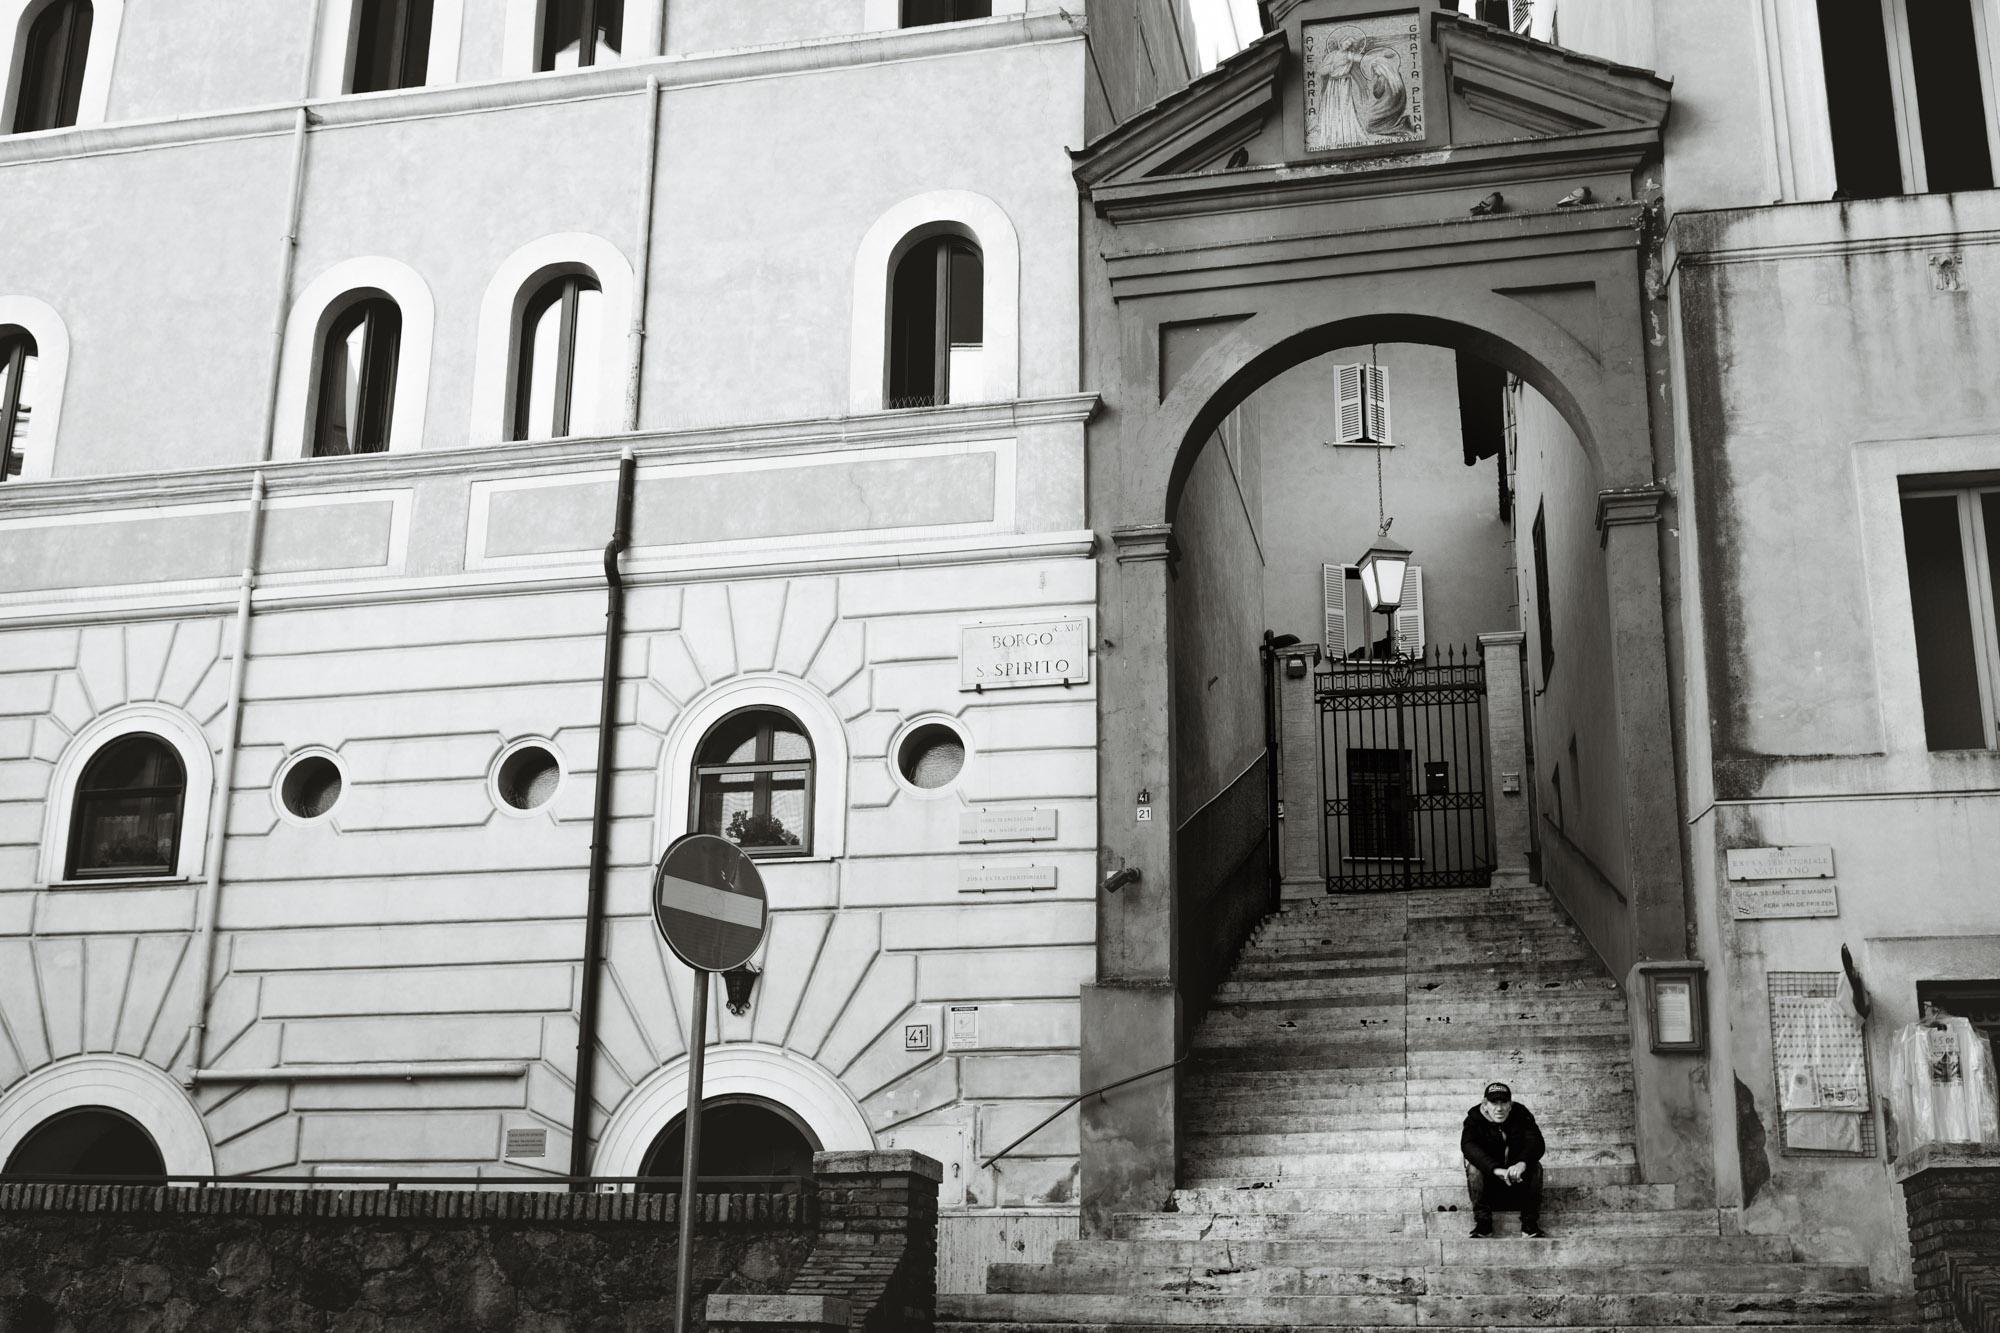 Man sitting on stoop near Vatican City